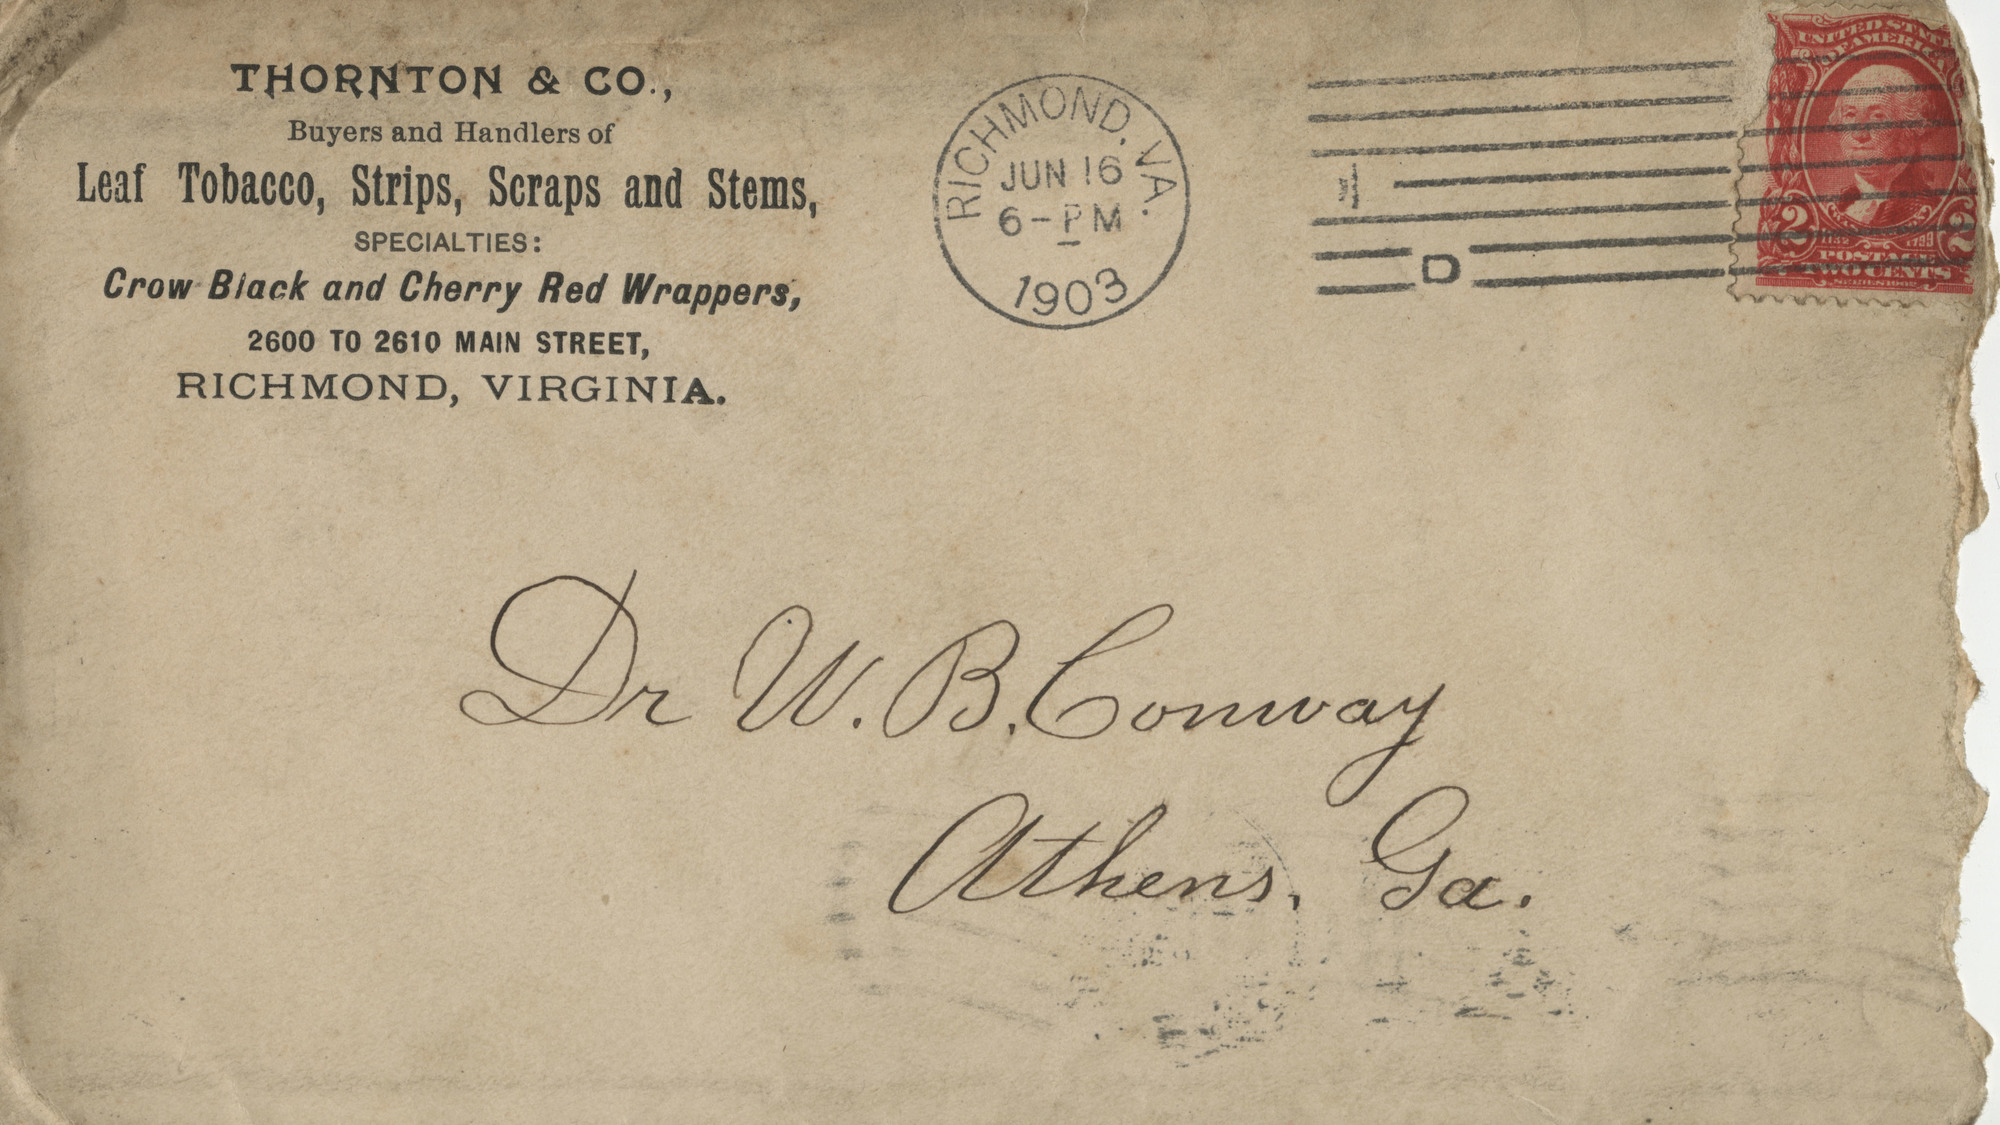 http://spec.lib.vt.edu/pickup/Omeka_upload/Ms2012-039_ConwayCatlett_F4_Letter_1903_0616_enva.jpg